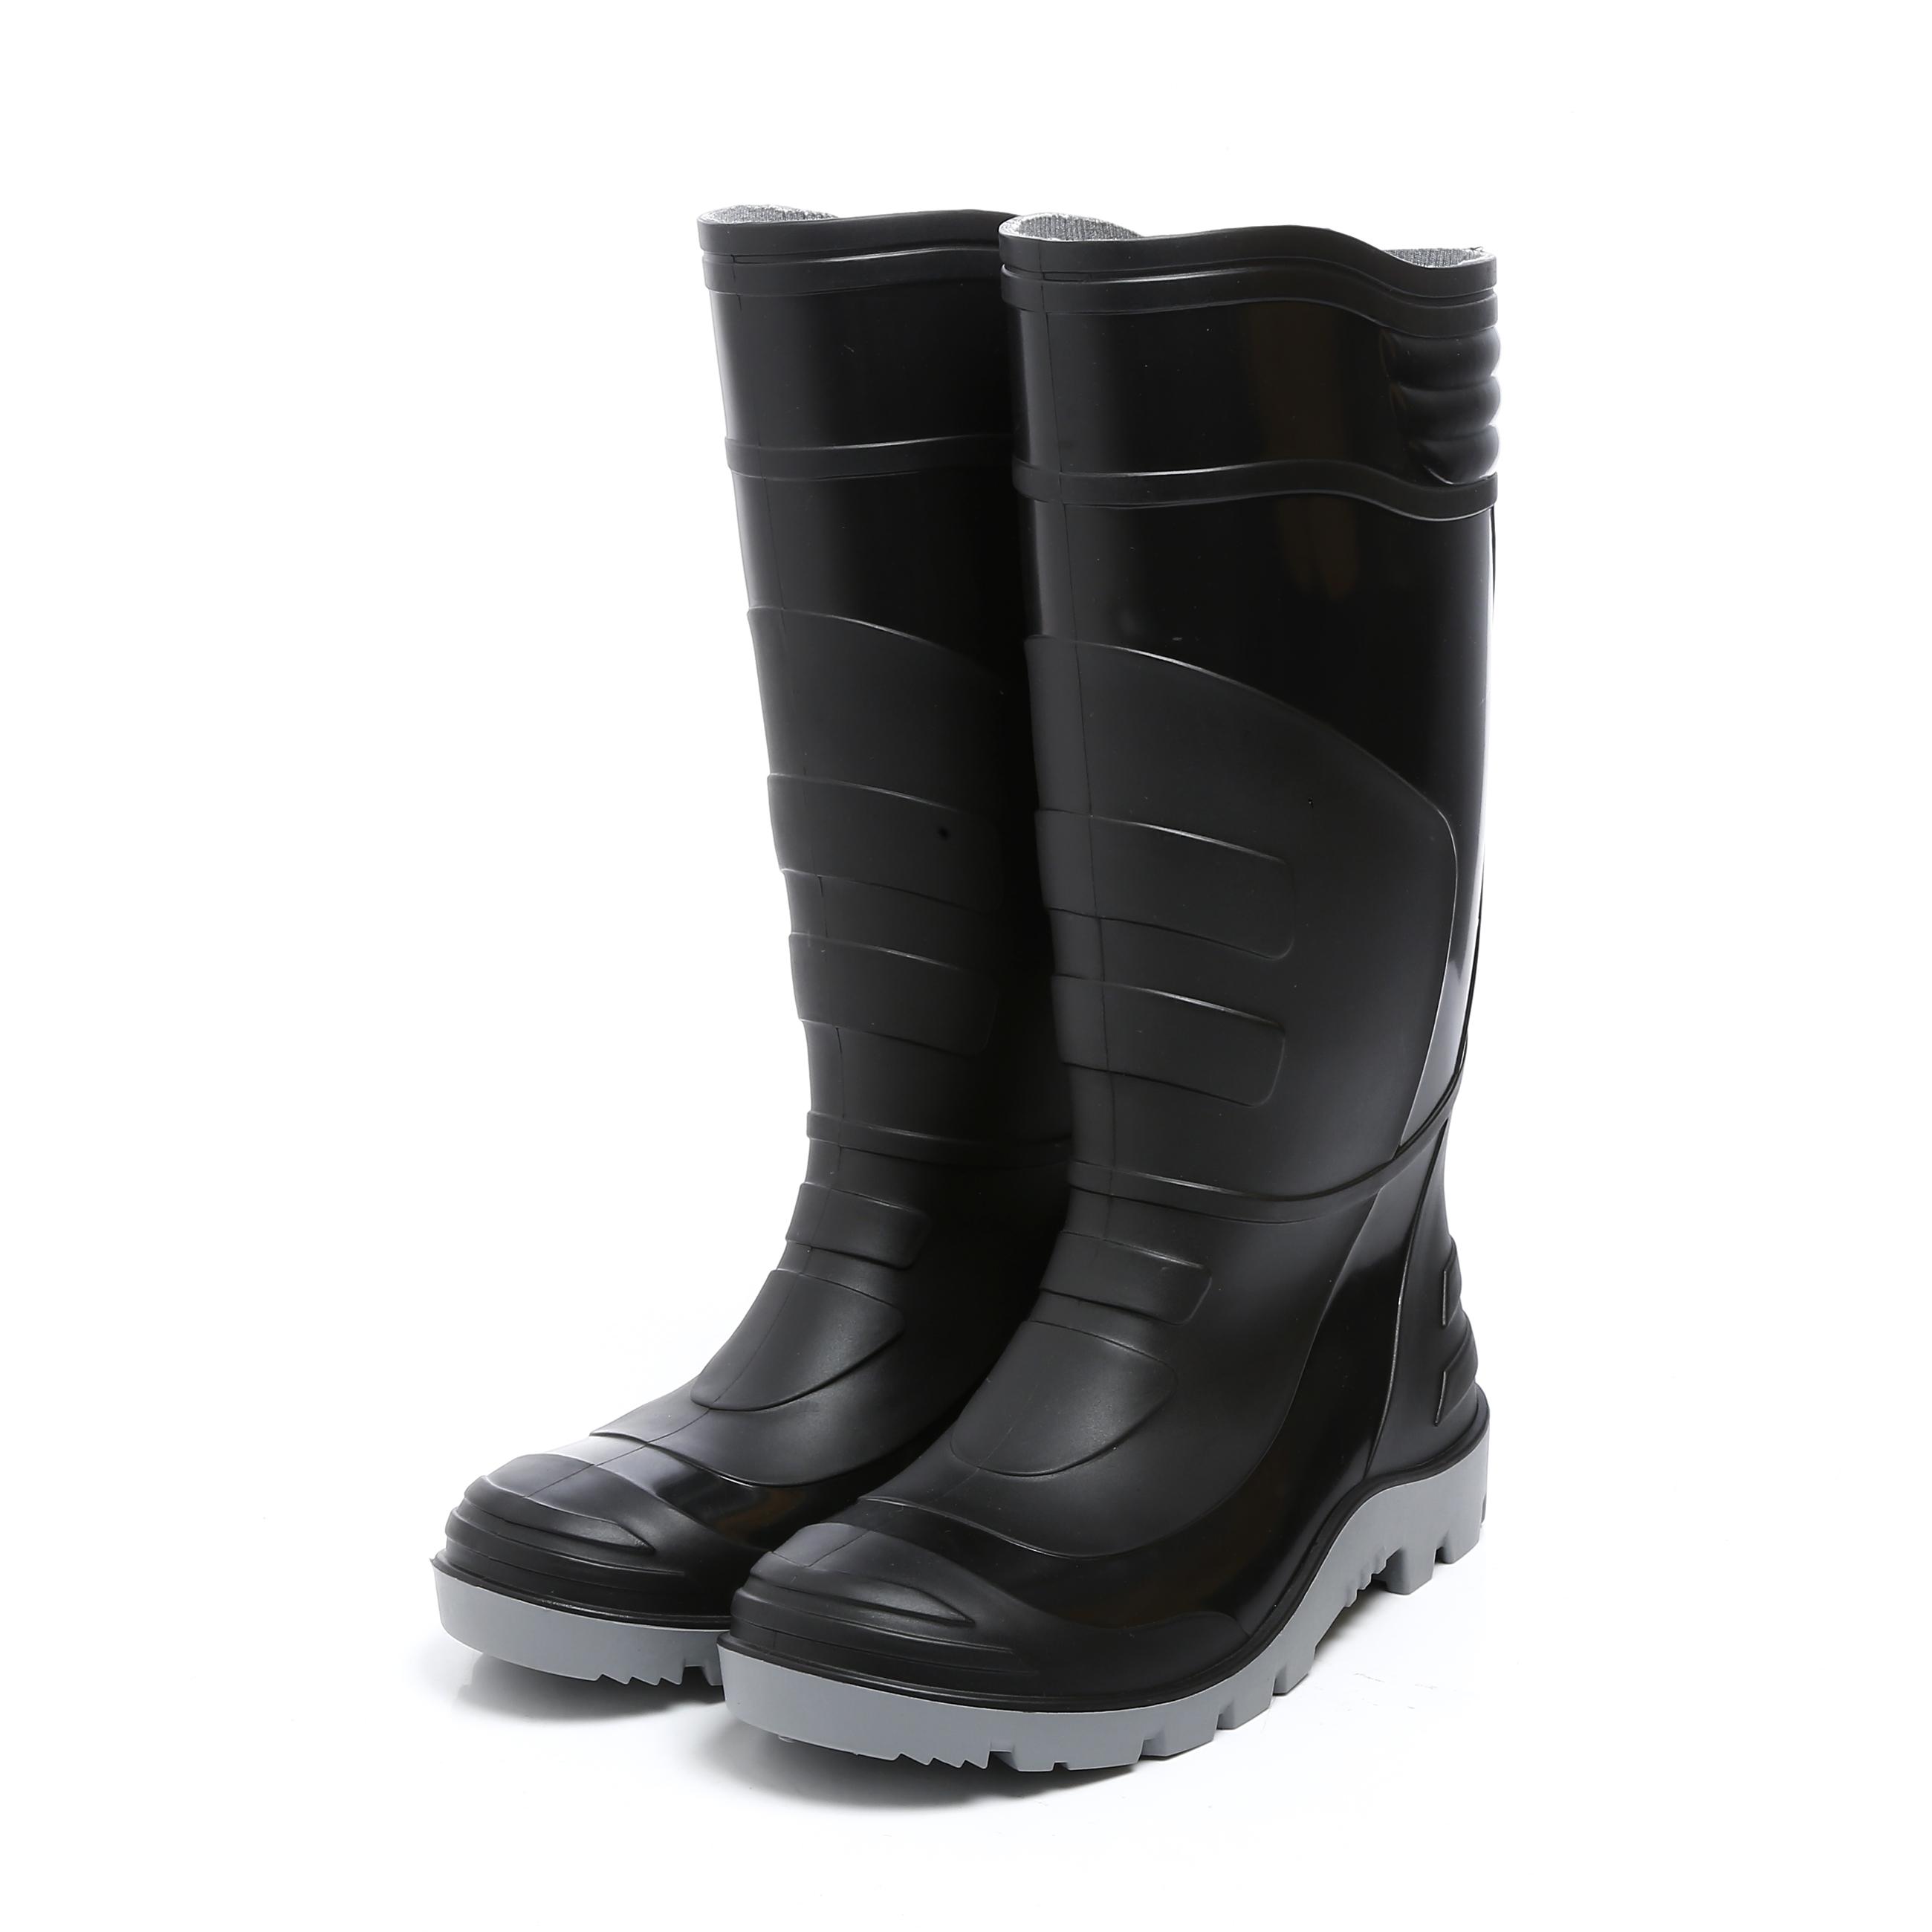 FDDI Tested Boots